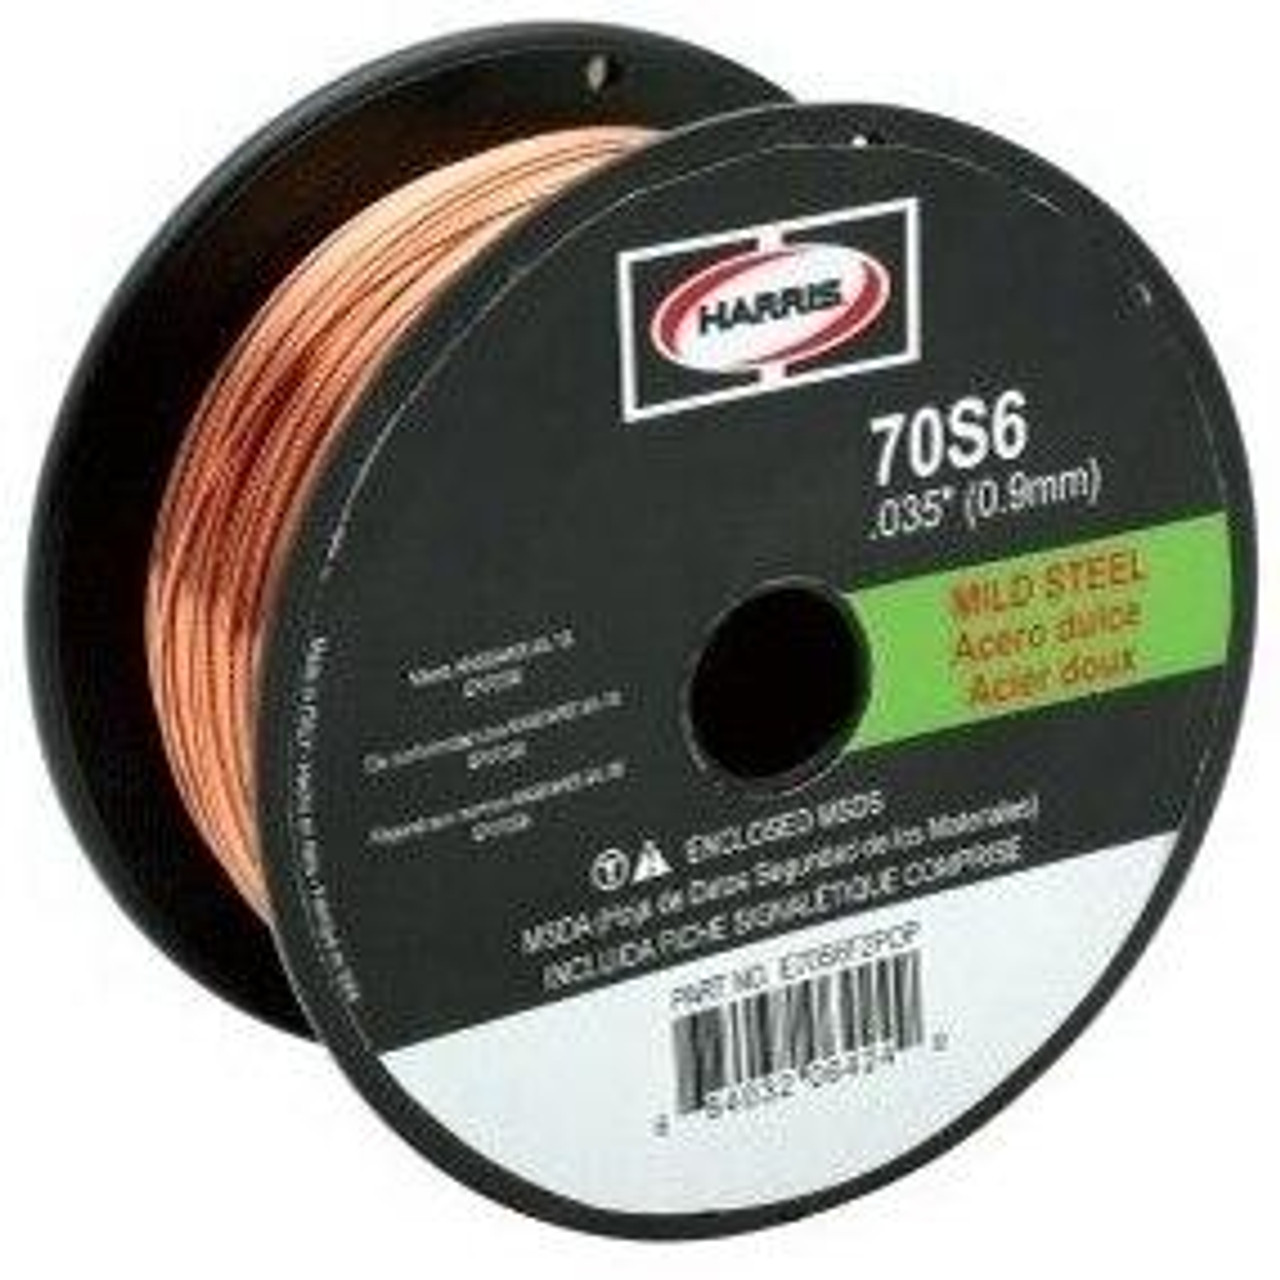 Harris ER 70S-6 MIG Welding Wire .035 on 11 lb Spools